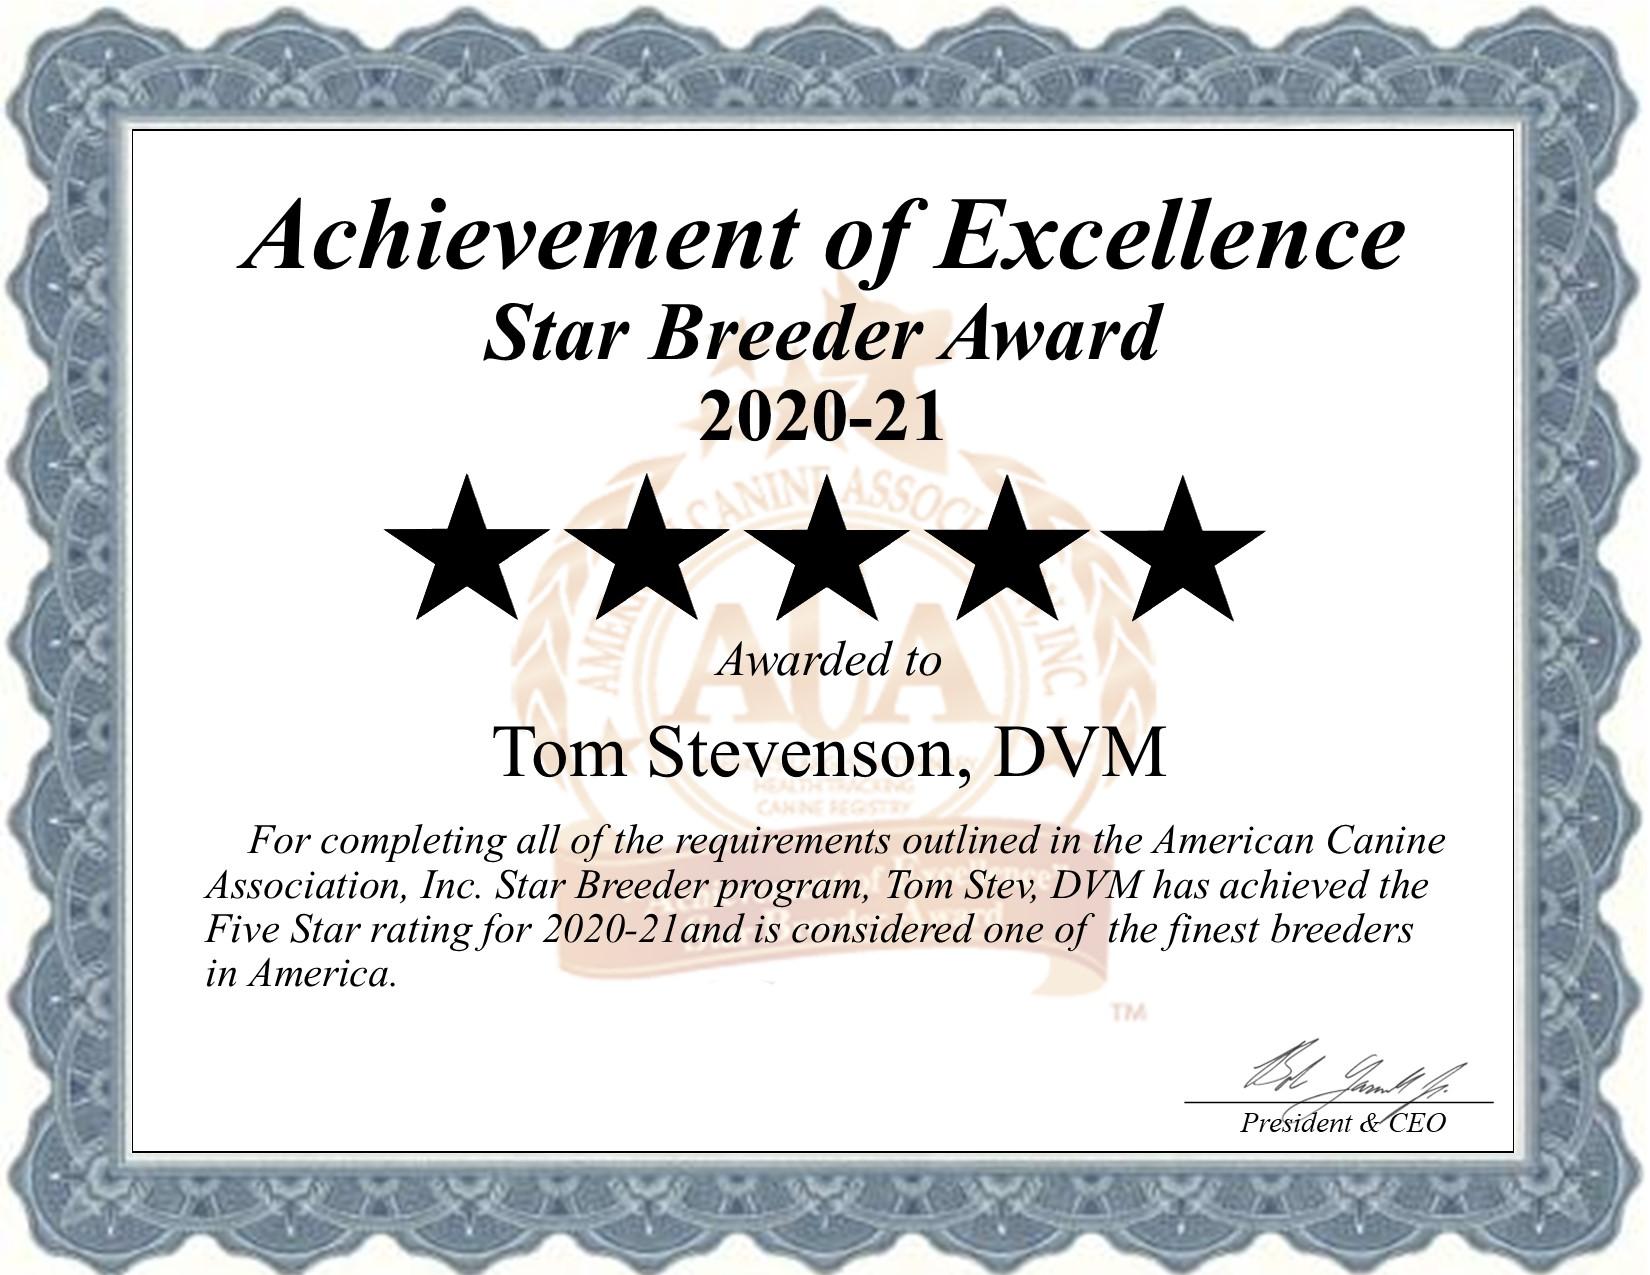 Tom, Stevenson, DVM, dog, breeder, star, certificate, Tom-Stevenson, DVM, Moscow, ID, Idaho, puppy, dog, kennels, mill, puppymill, usda, 5-star, aca, ica, registered, italian, greyhound